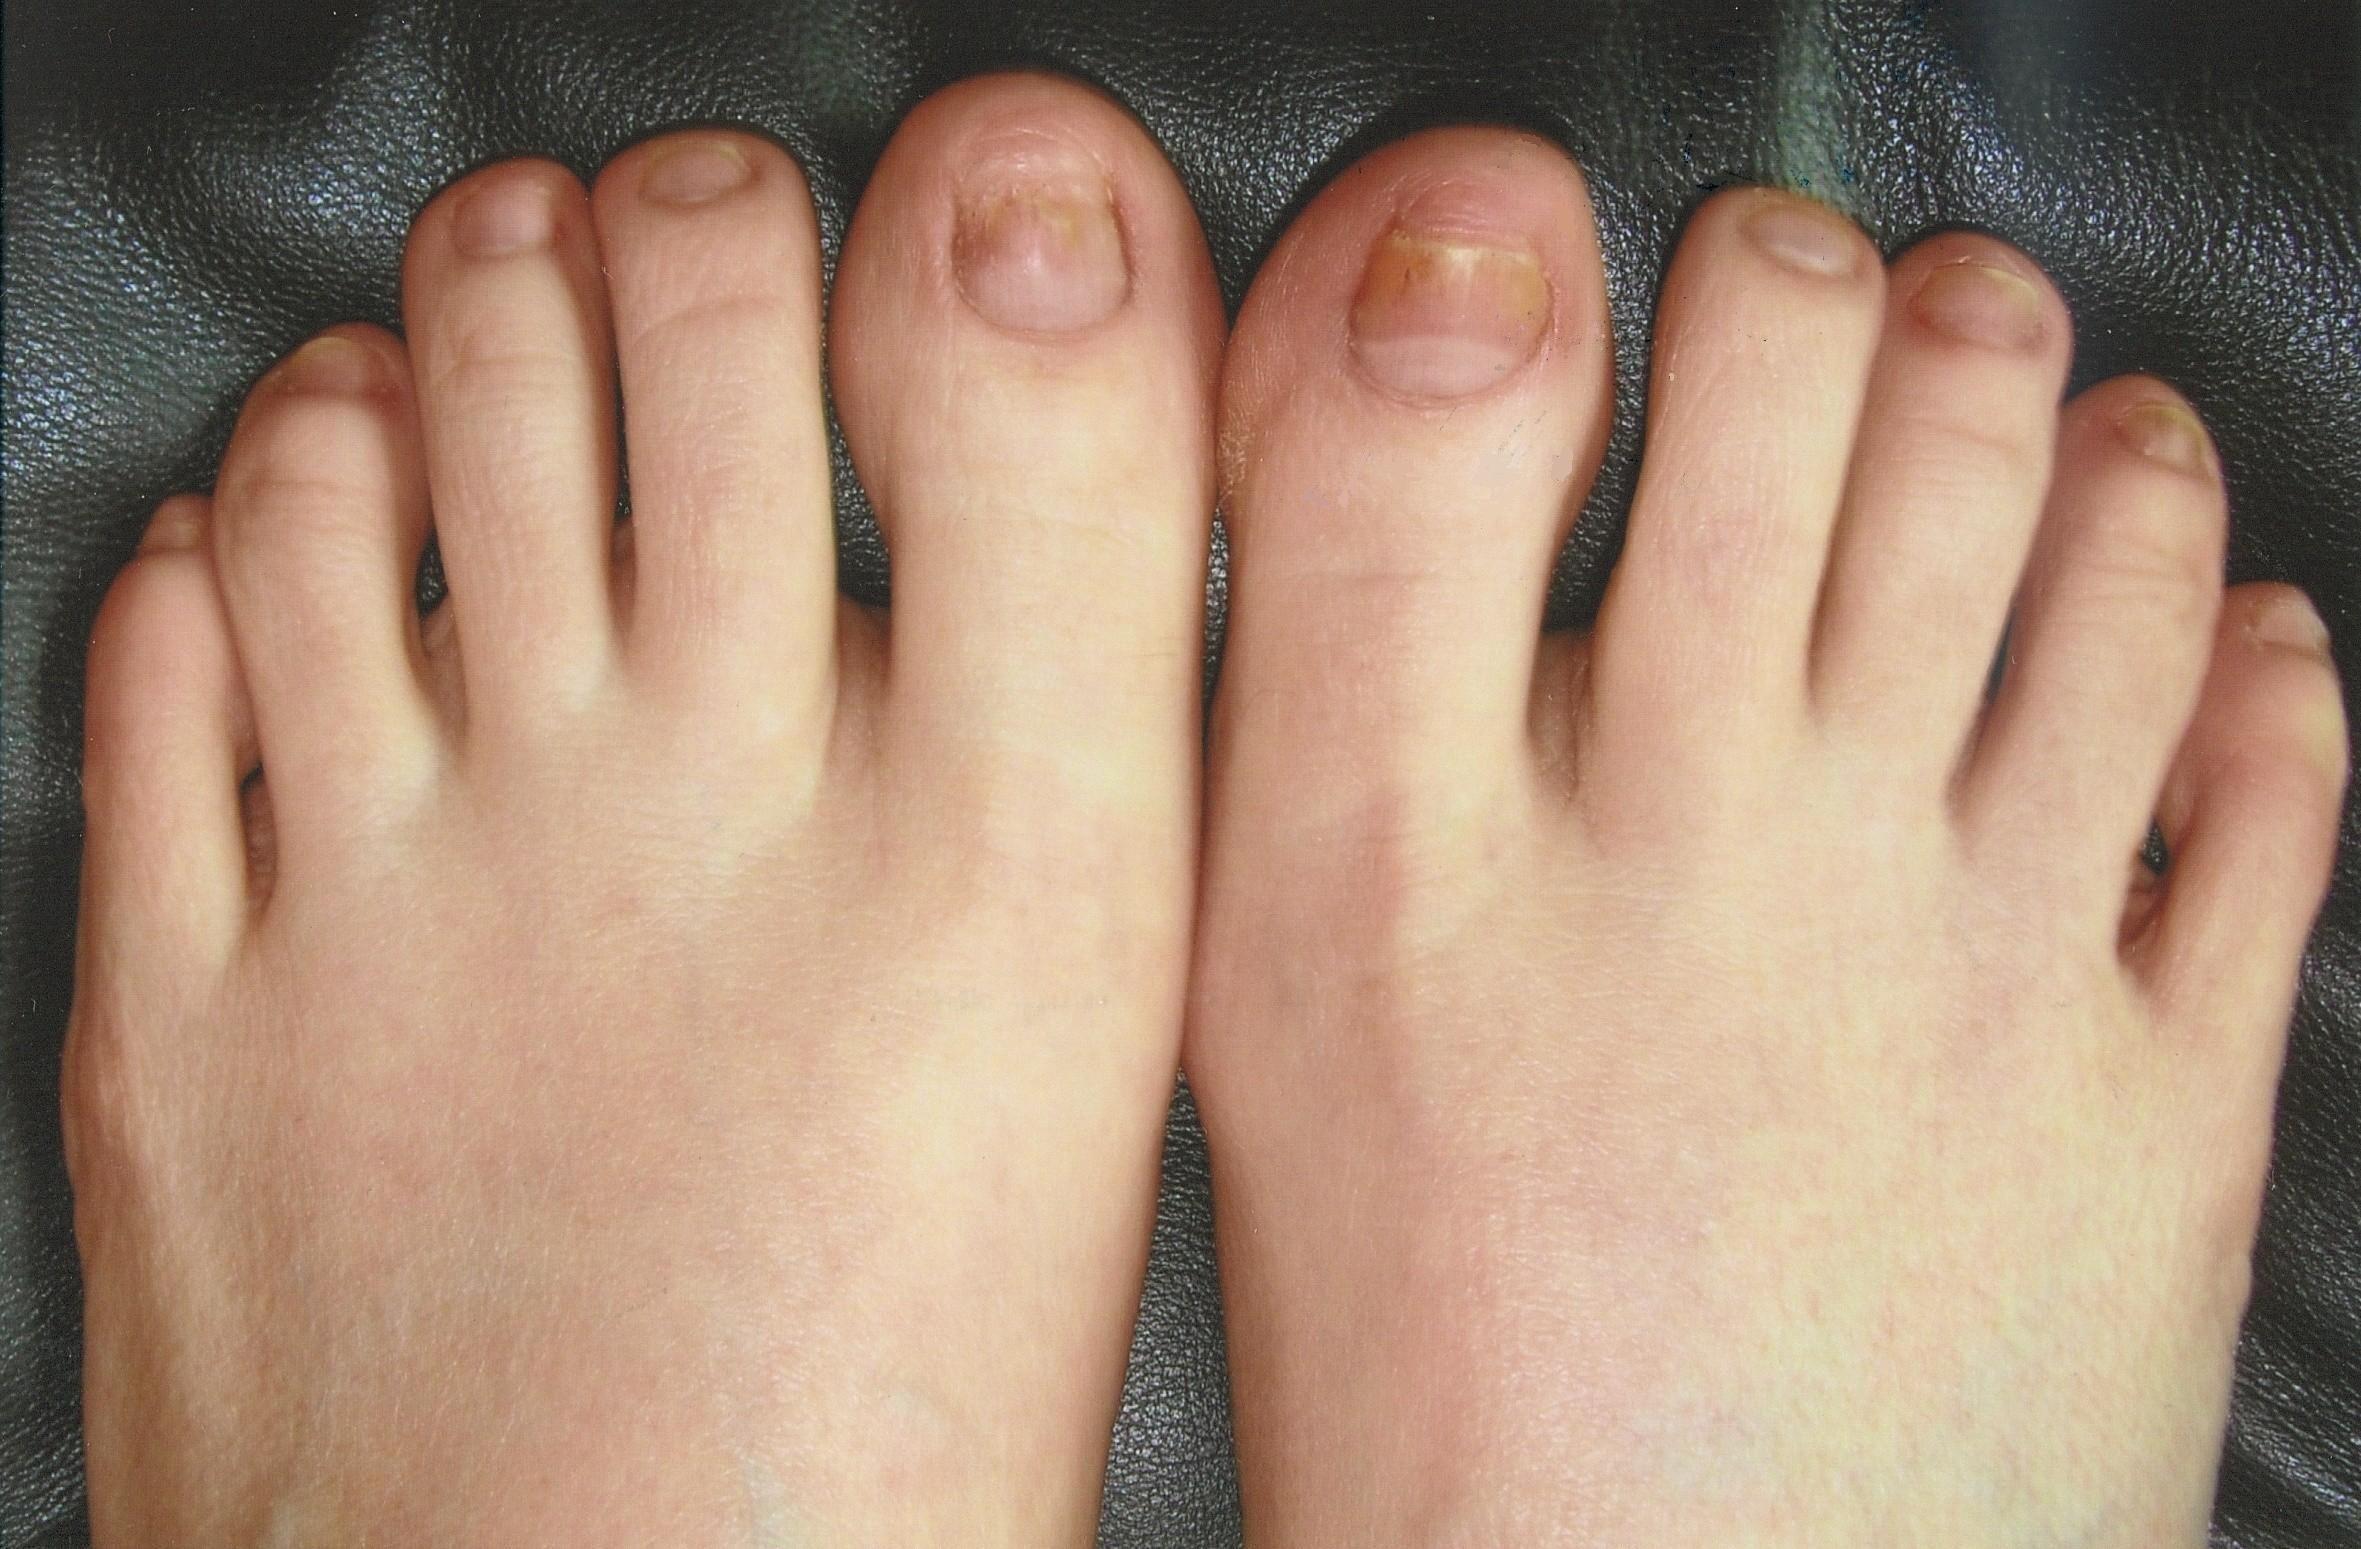 Finger toe nail fungus treatments ebook for remedies | Toenail ...